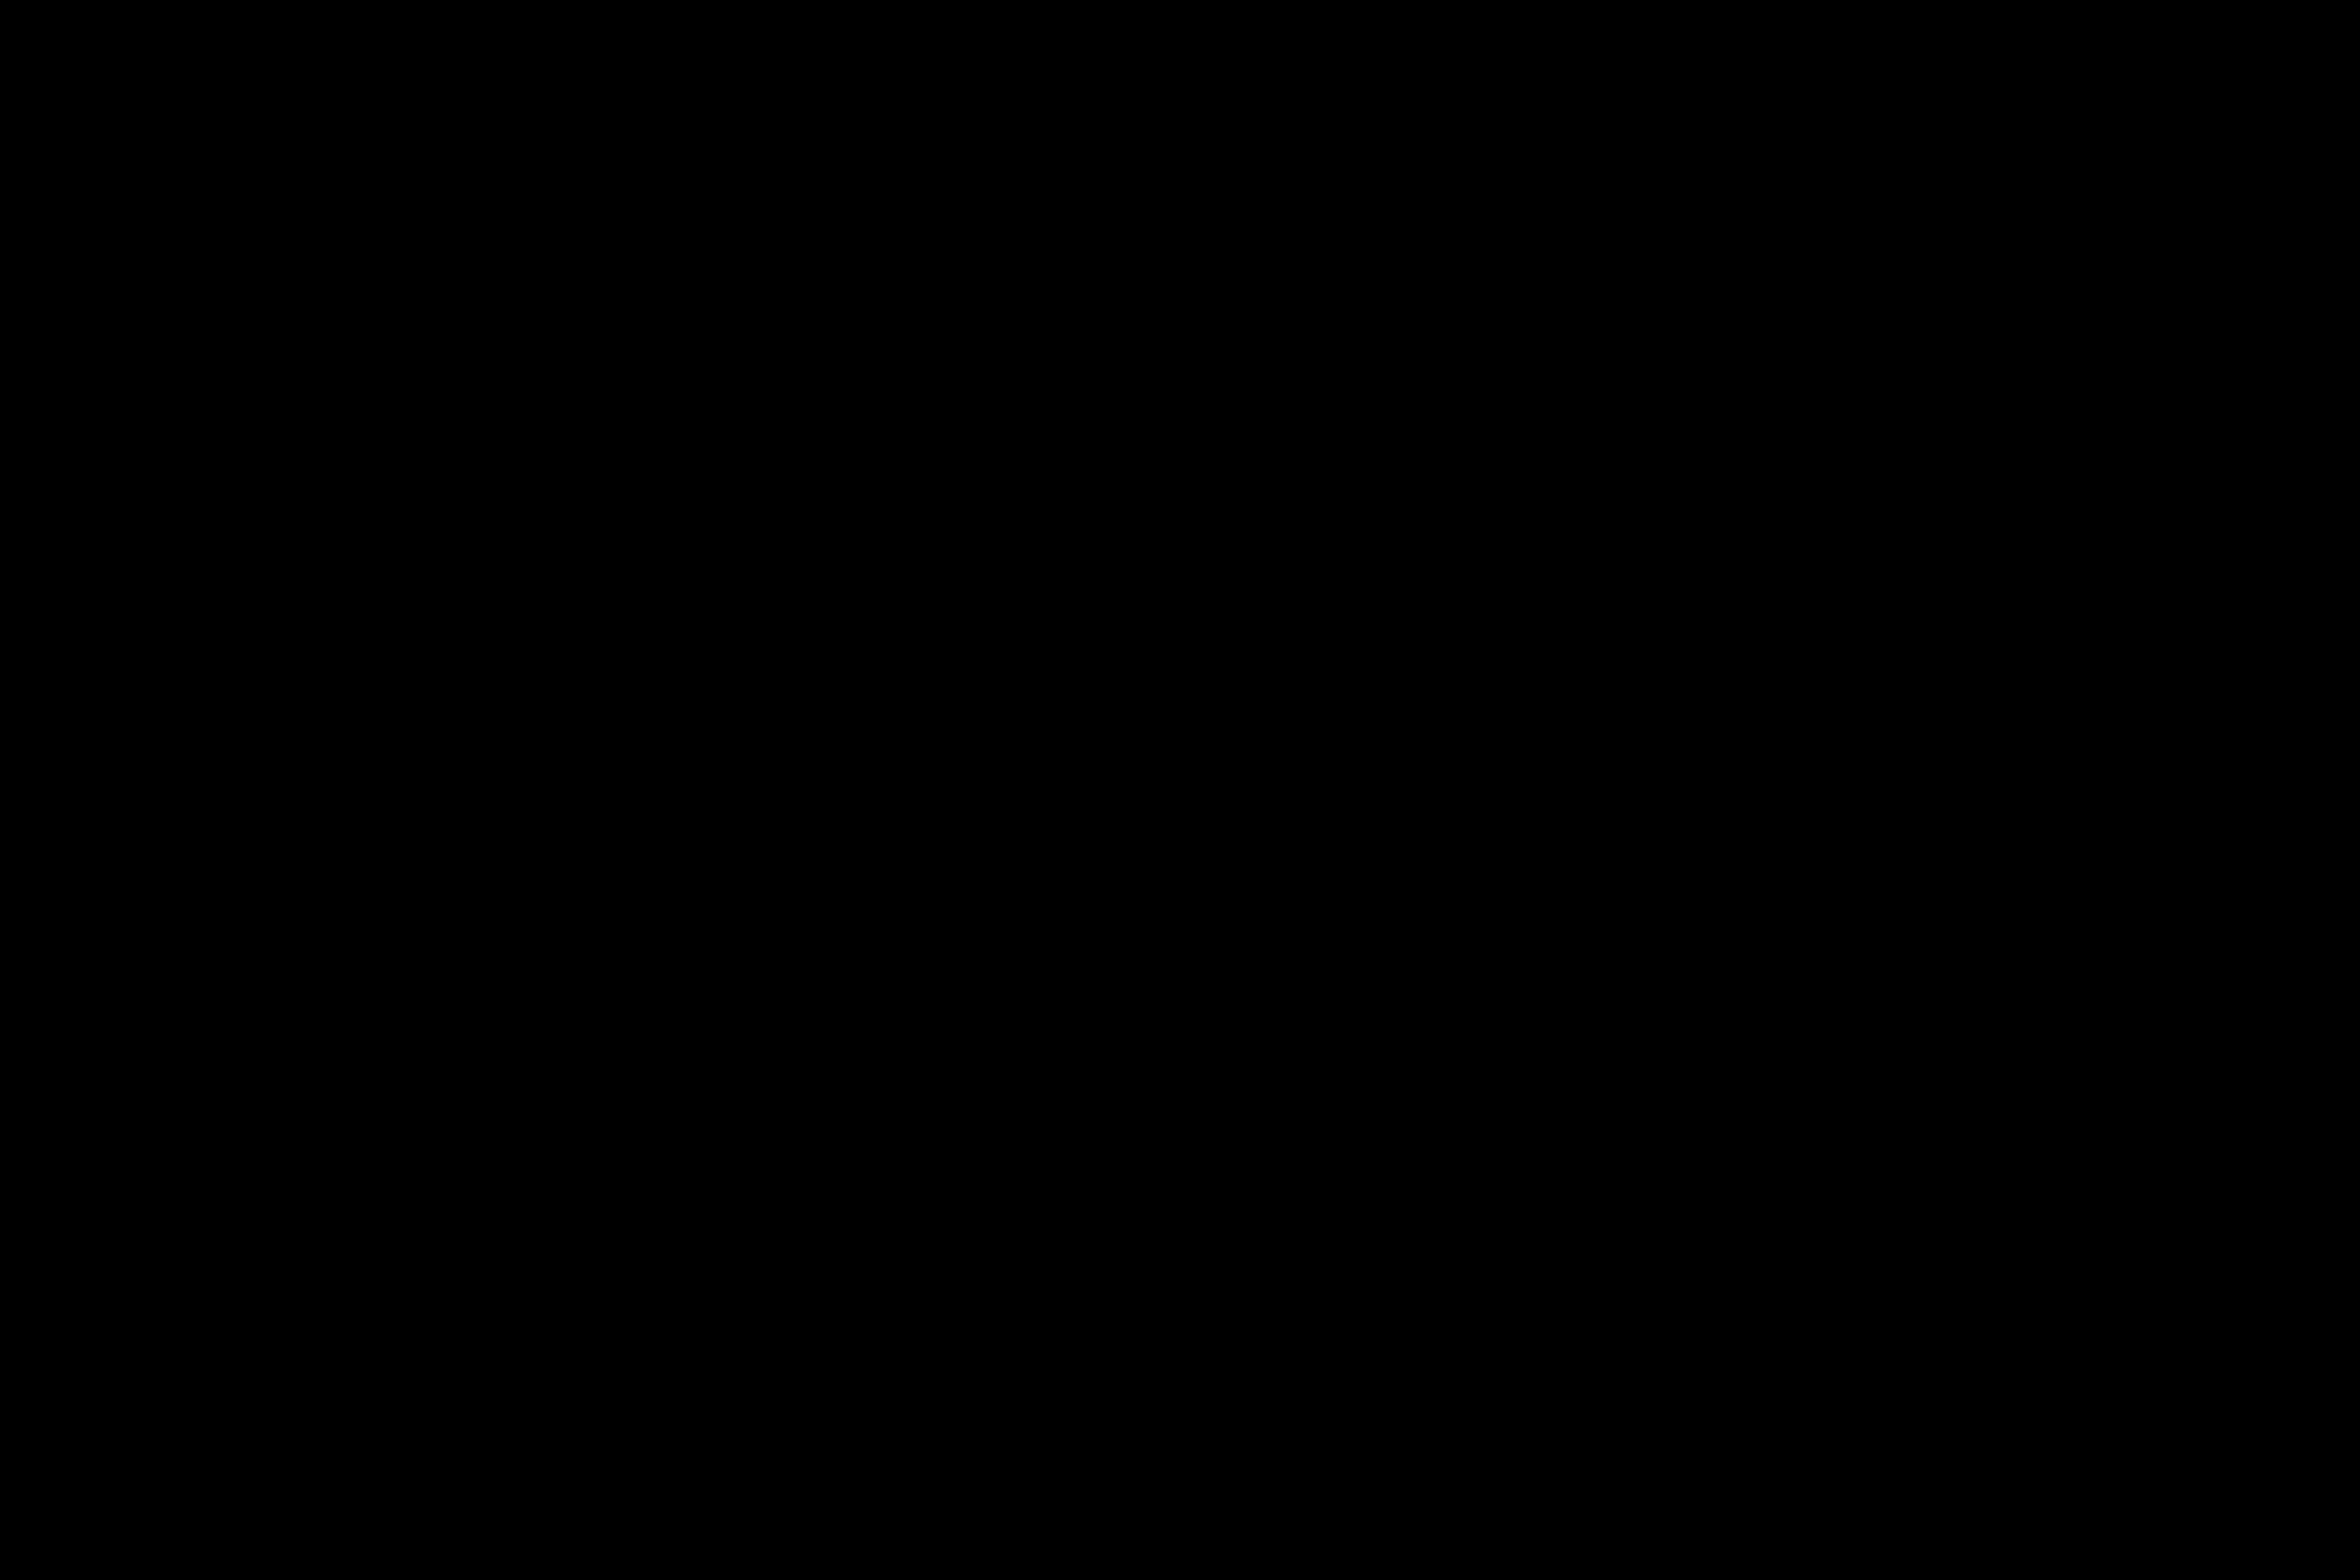 Jochem-Herremans-white-hiRes-zonder.png